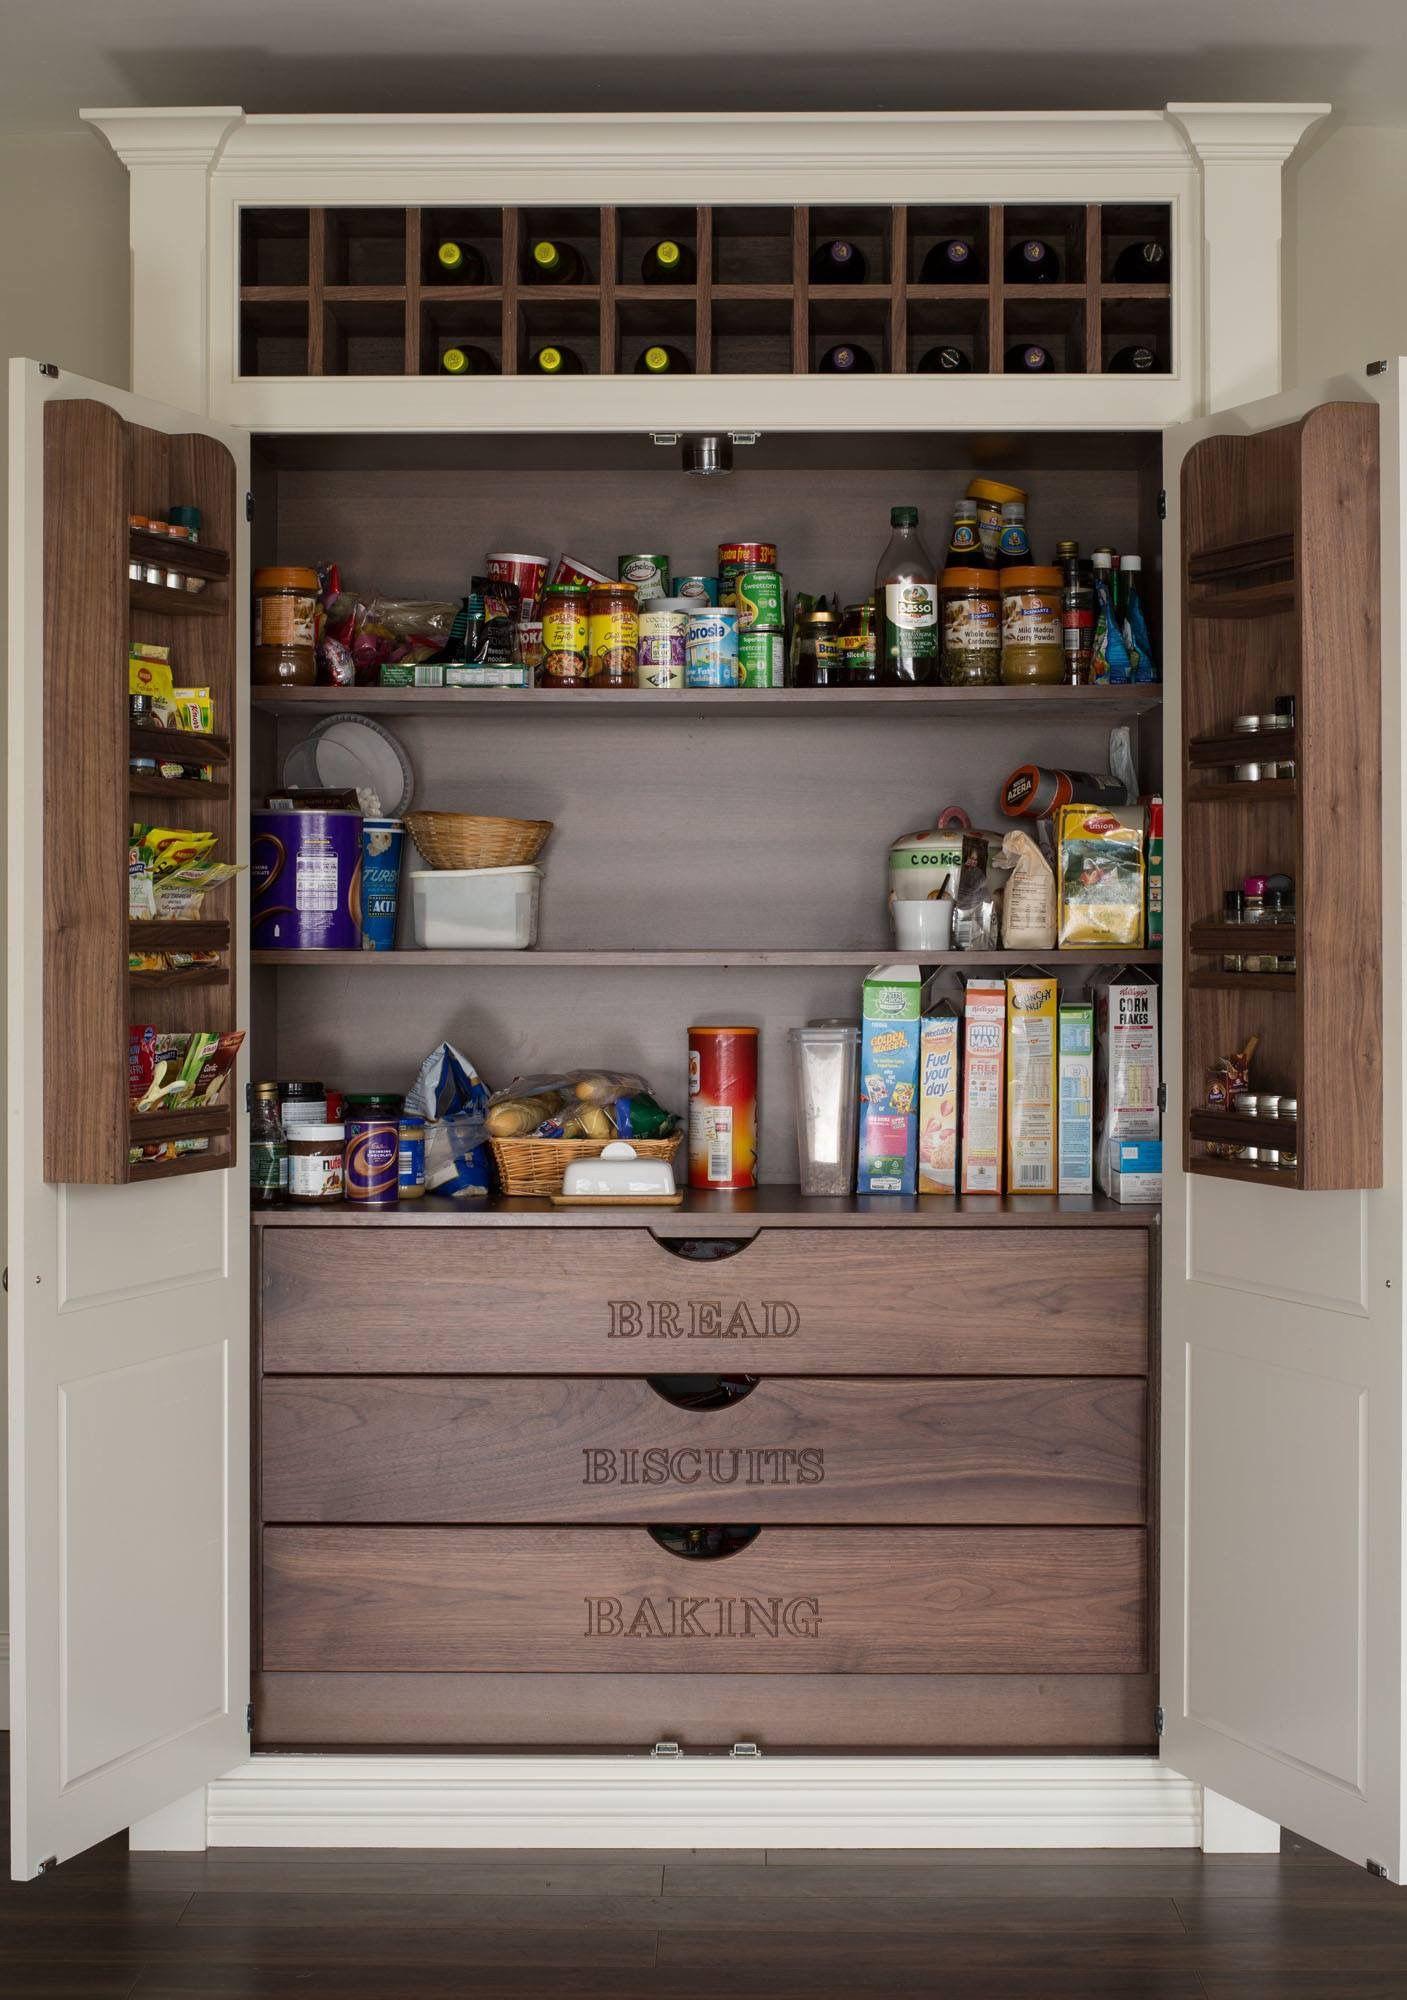 Pin by lyn opiela on organizing u storage pinterest storage